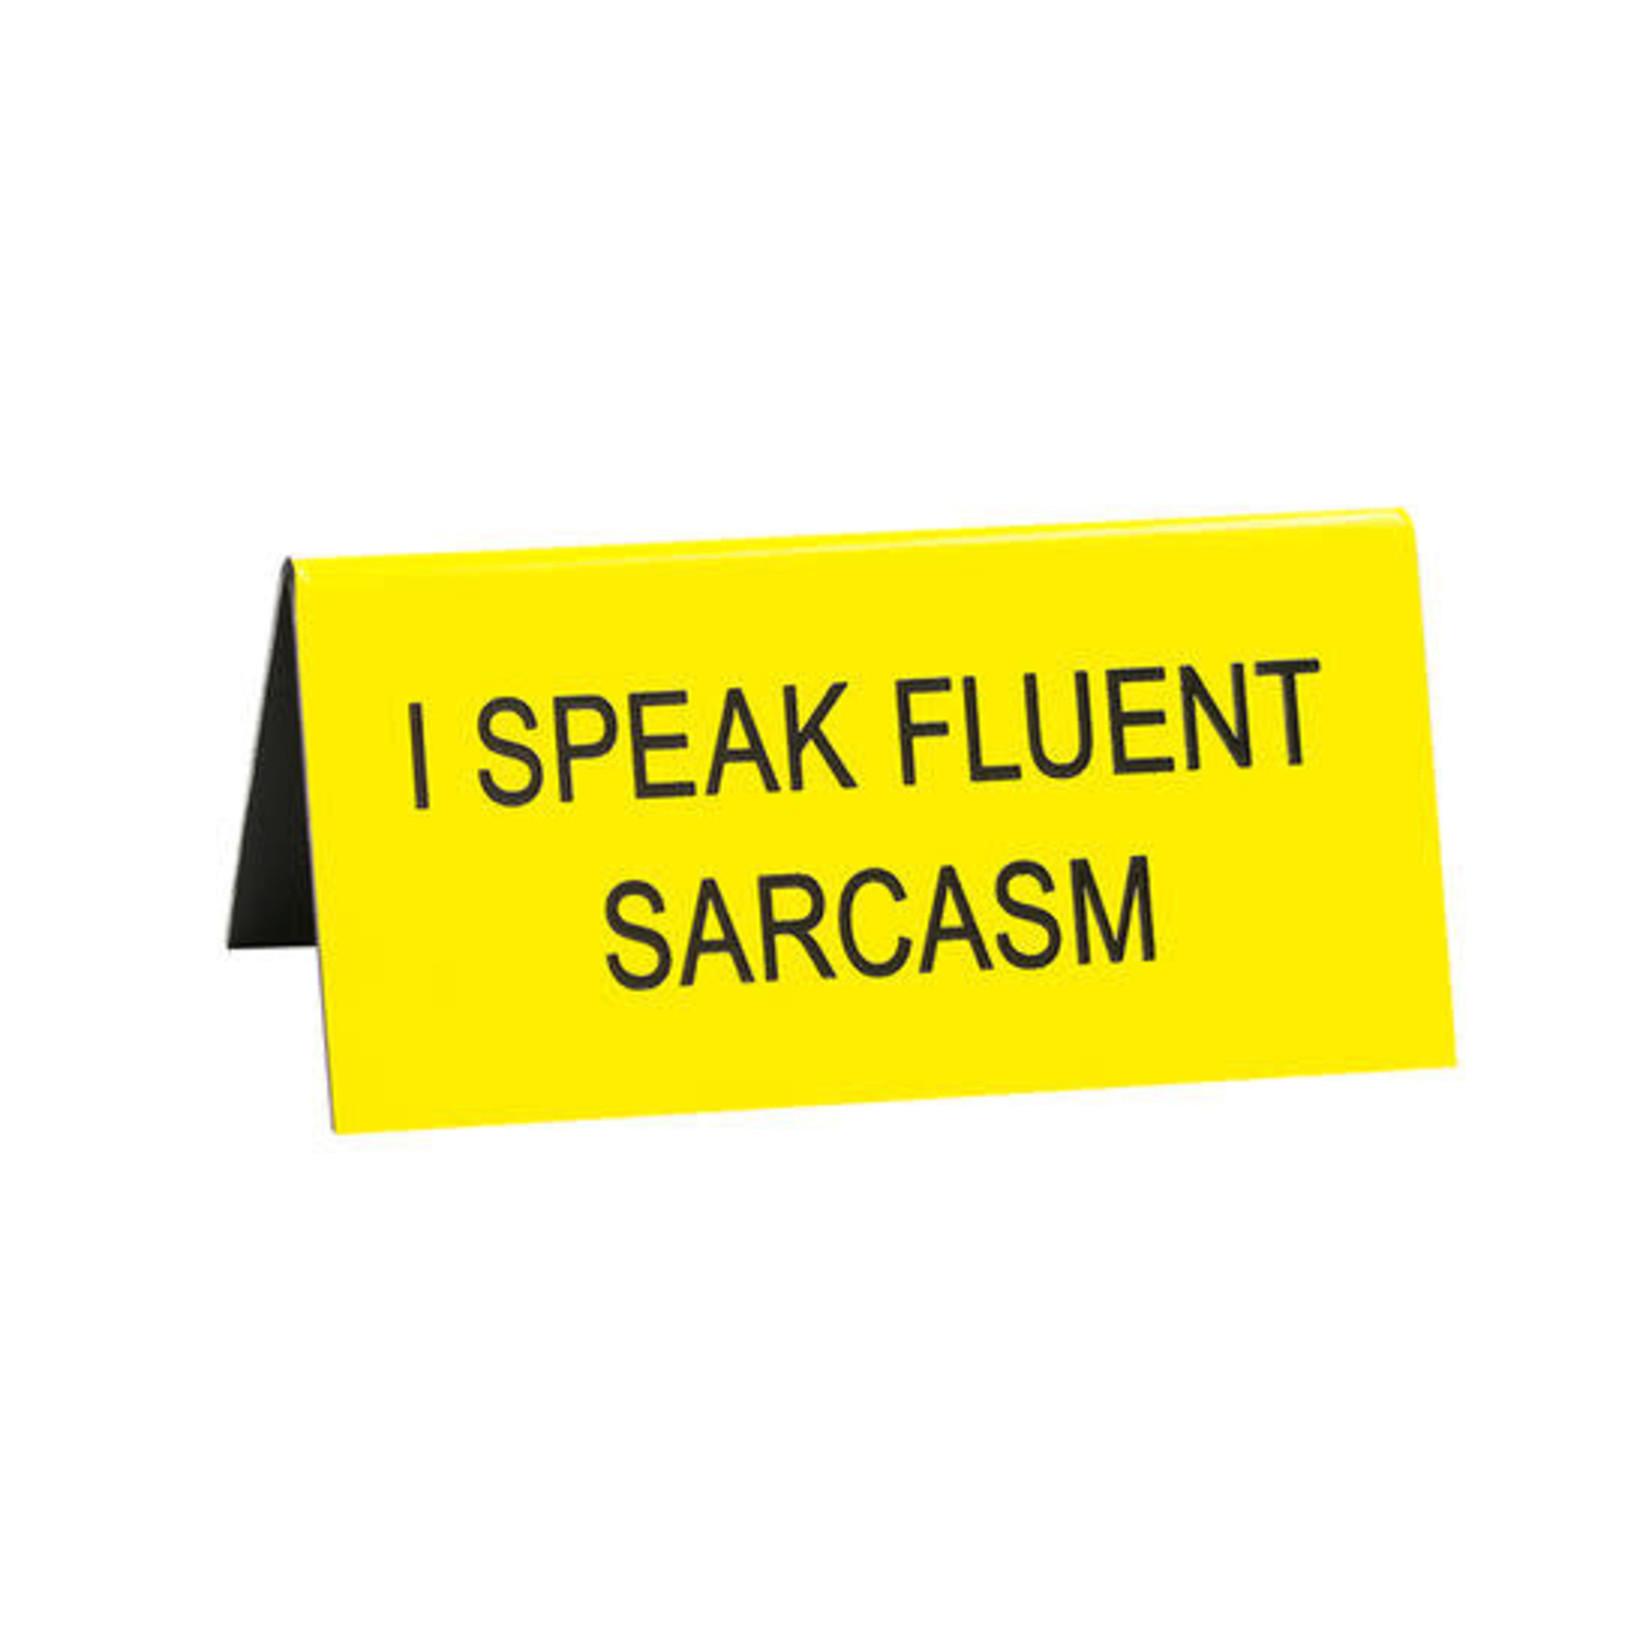 About Face Designs, Inc Snarky: Speak Fluent Sarcasm